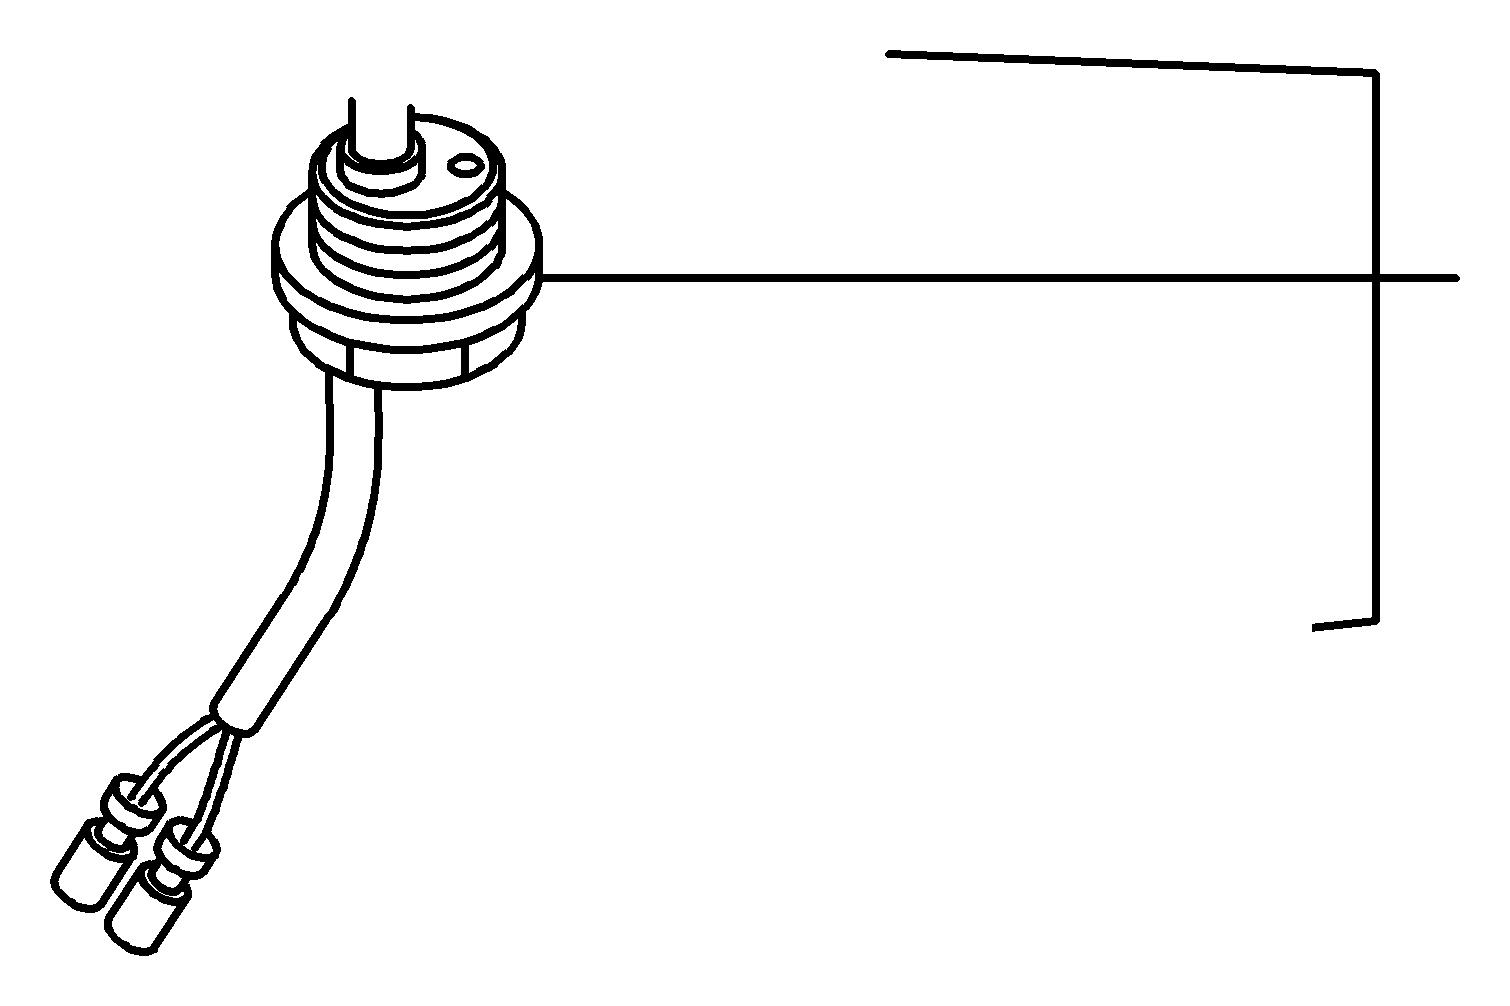 isuzu ascender wiring diagram ca 2338  view also idle air control valve on buick rainier wiring  idle air control valve on buick rainier